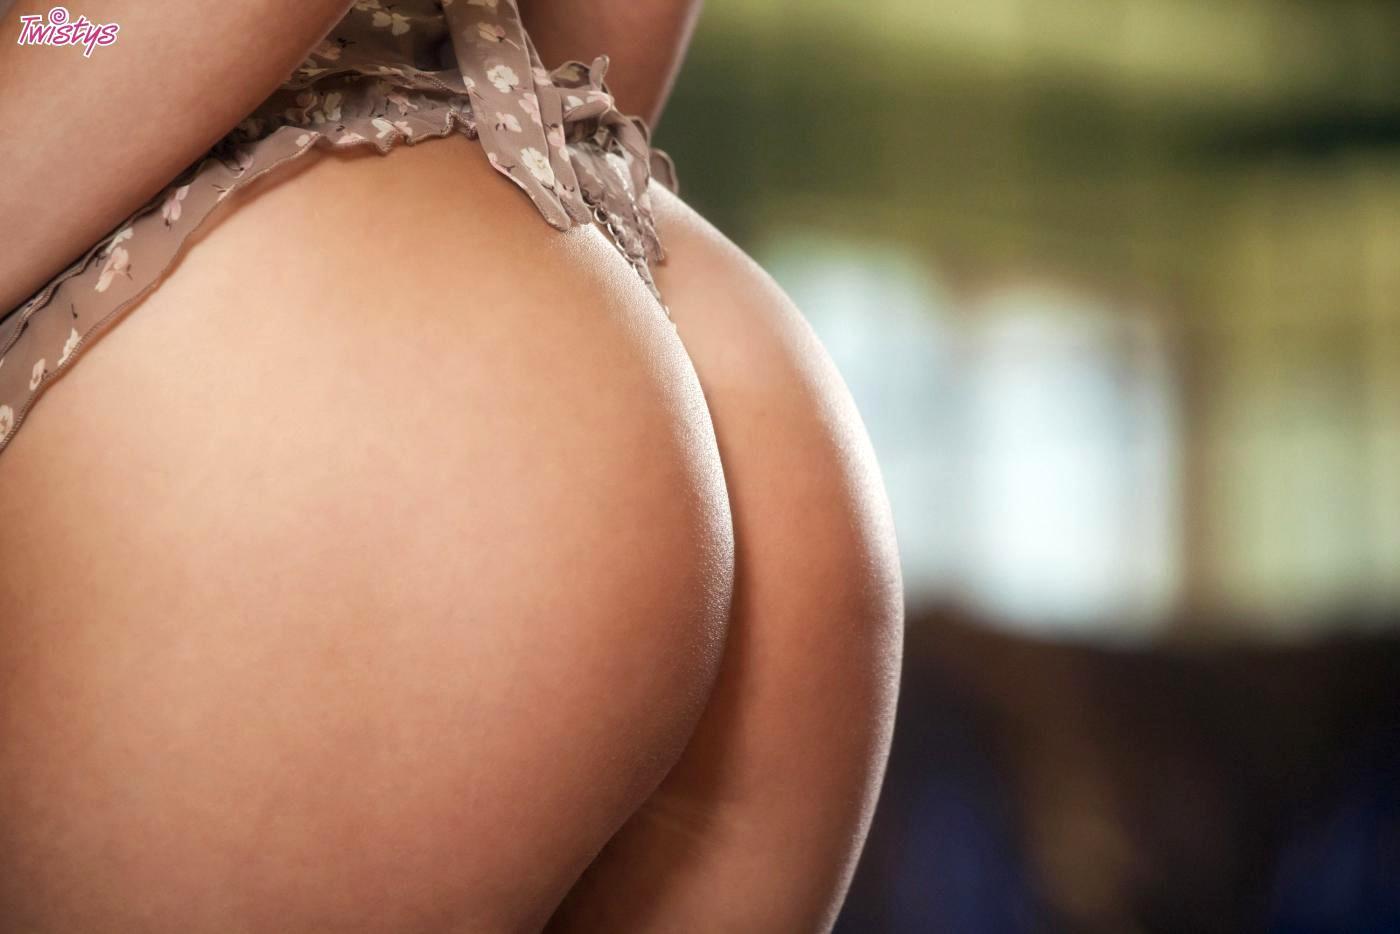 Brea bennett handjob SEXY STUNNING